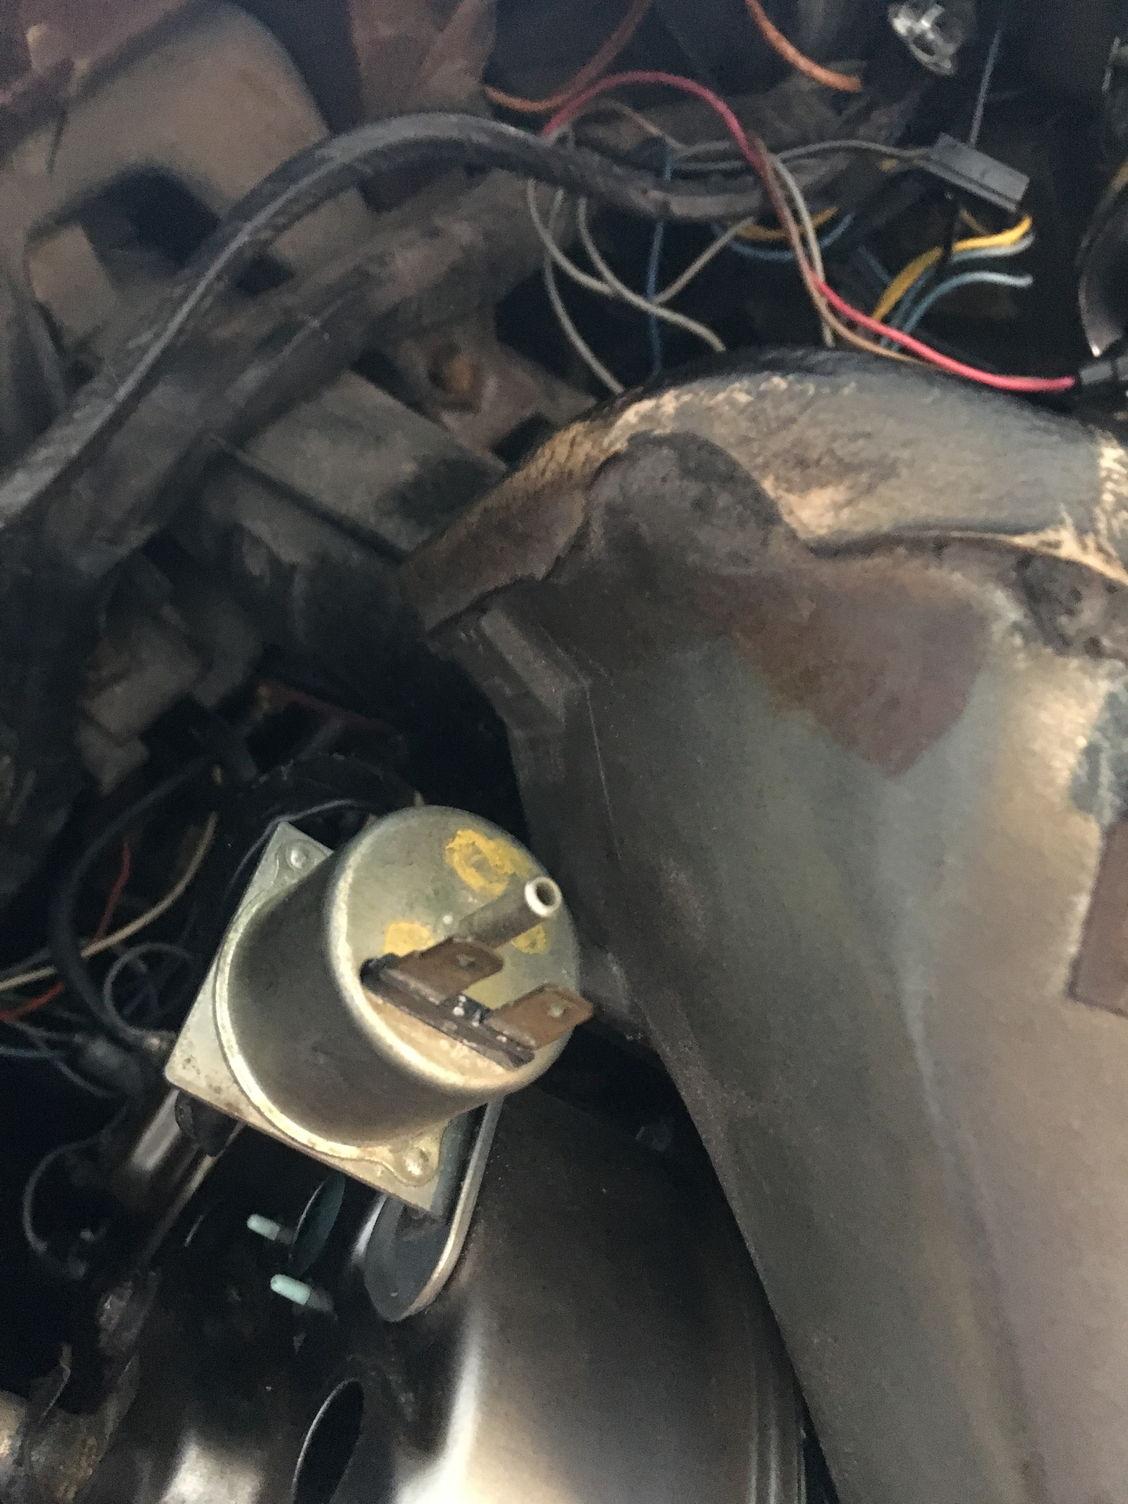 96 chevy turbo sel wiring diagram 96 chevy wheels wiring